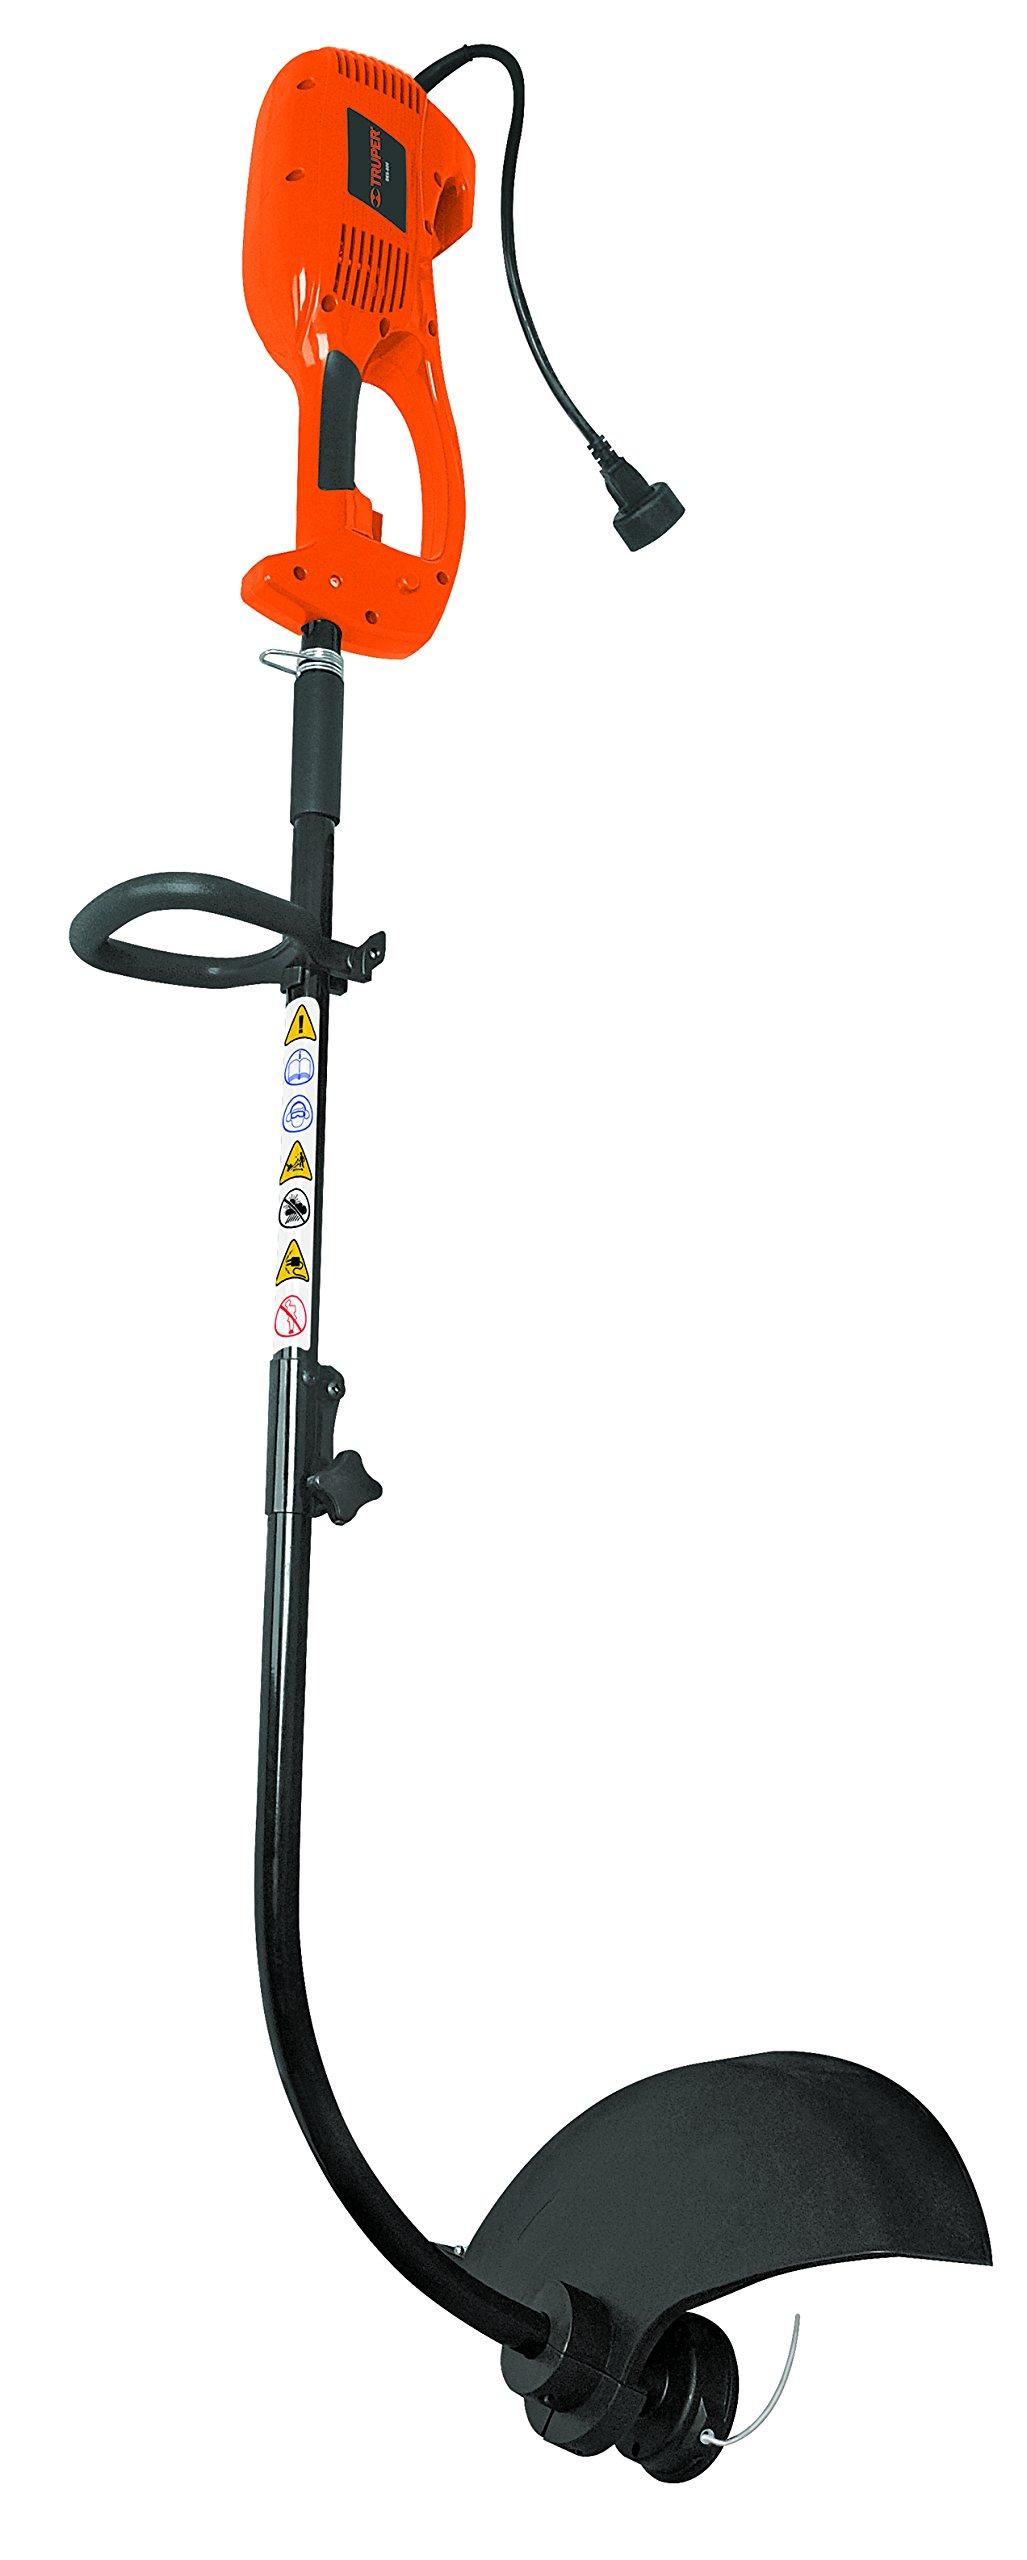 TRUPER DES-600 600 W / 15'' Electric String Trimmer by Truper (Image #1)